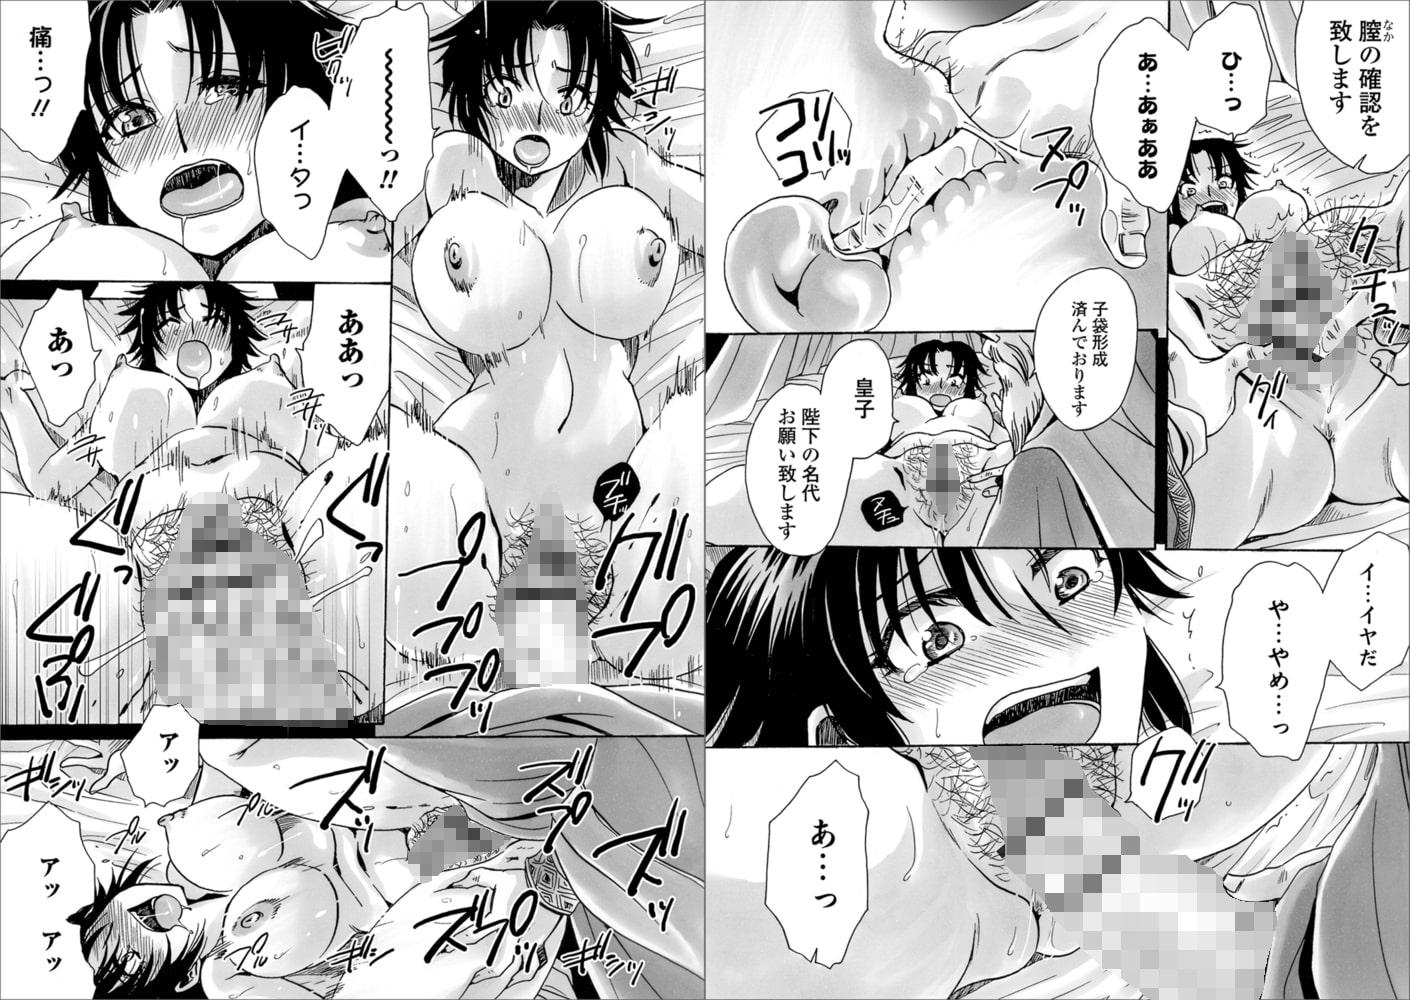 WEB版メスイキ!!にょたいか遊戯 Vol.02